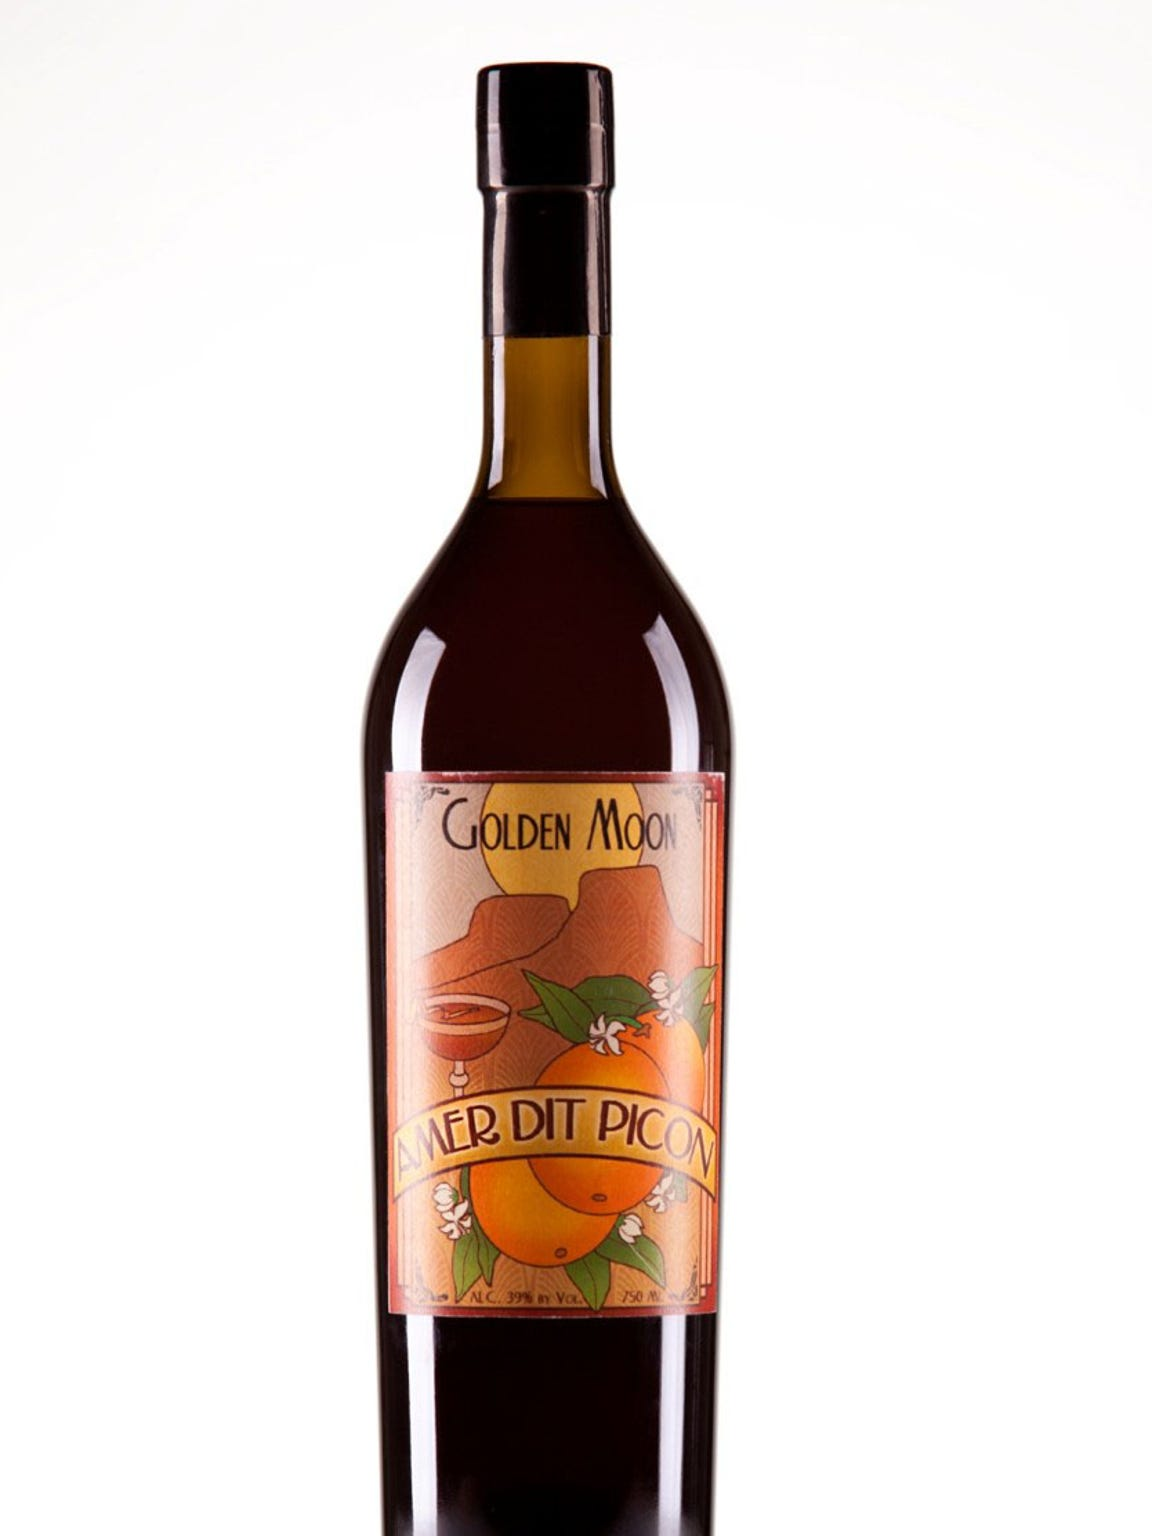 Golden Moon Amer dit Picon from Golden Moon Distillery